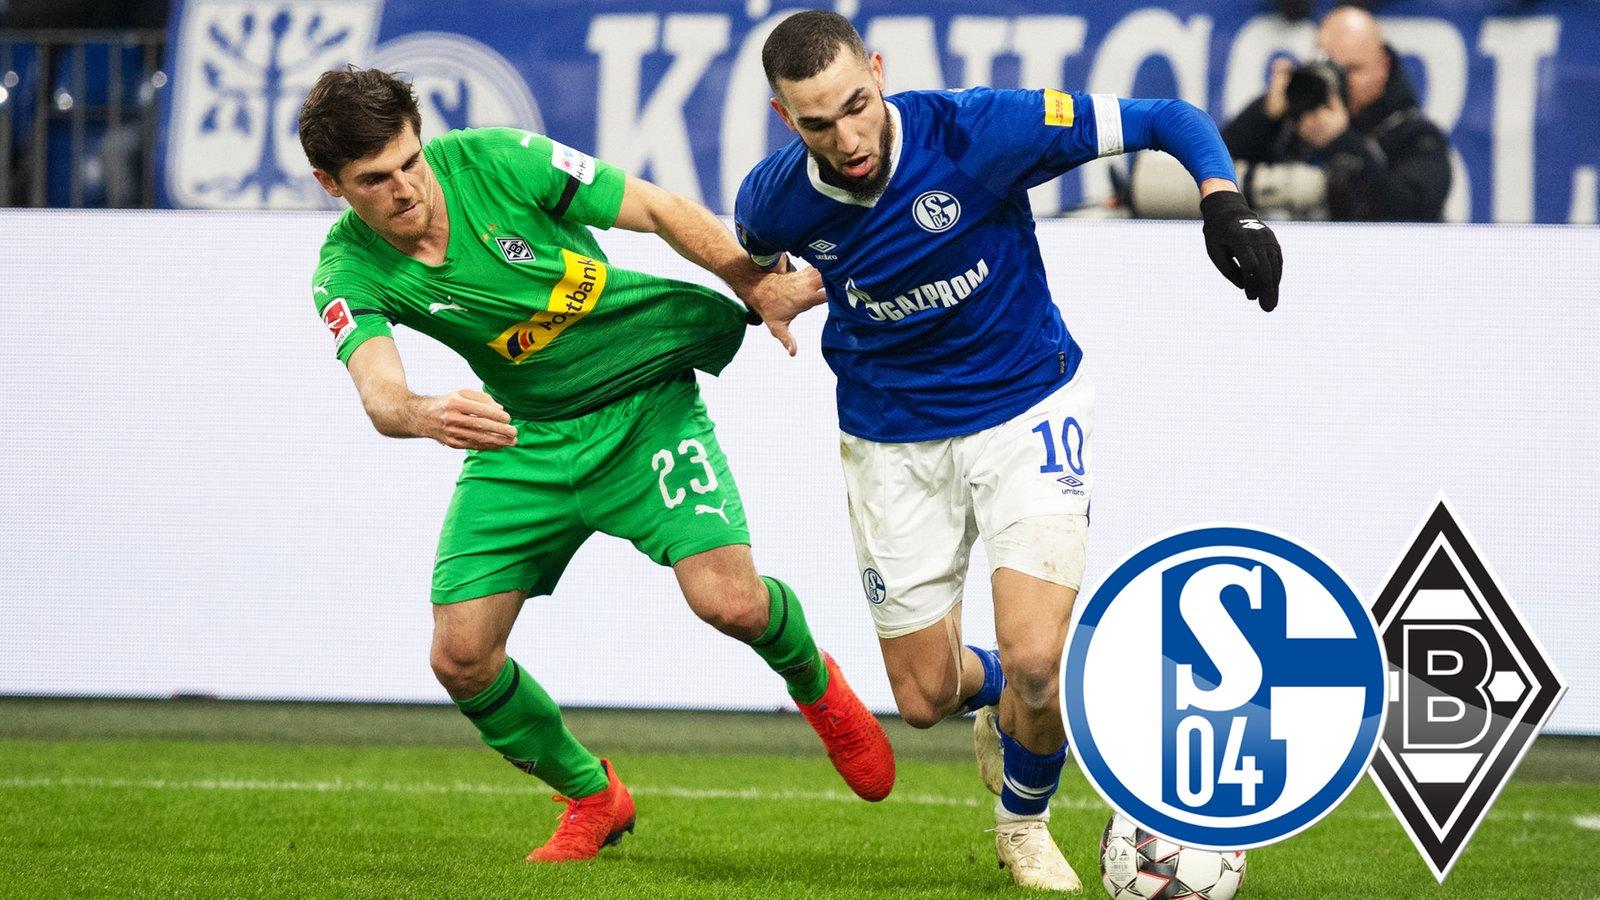 FC Schalke 04 vs Borussia Monchengladbach